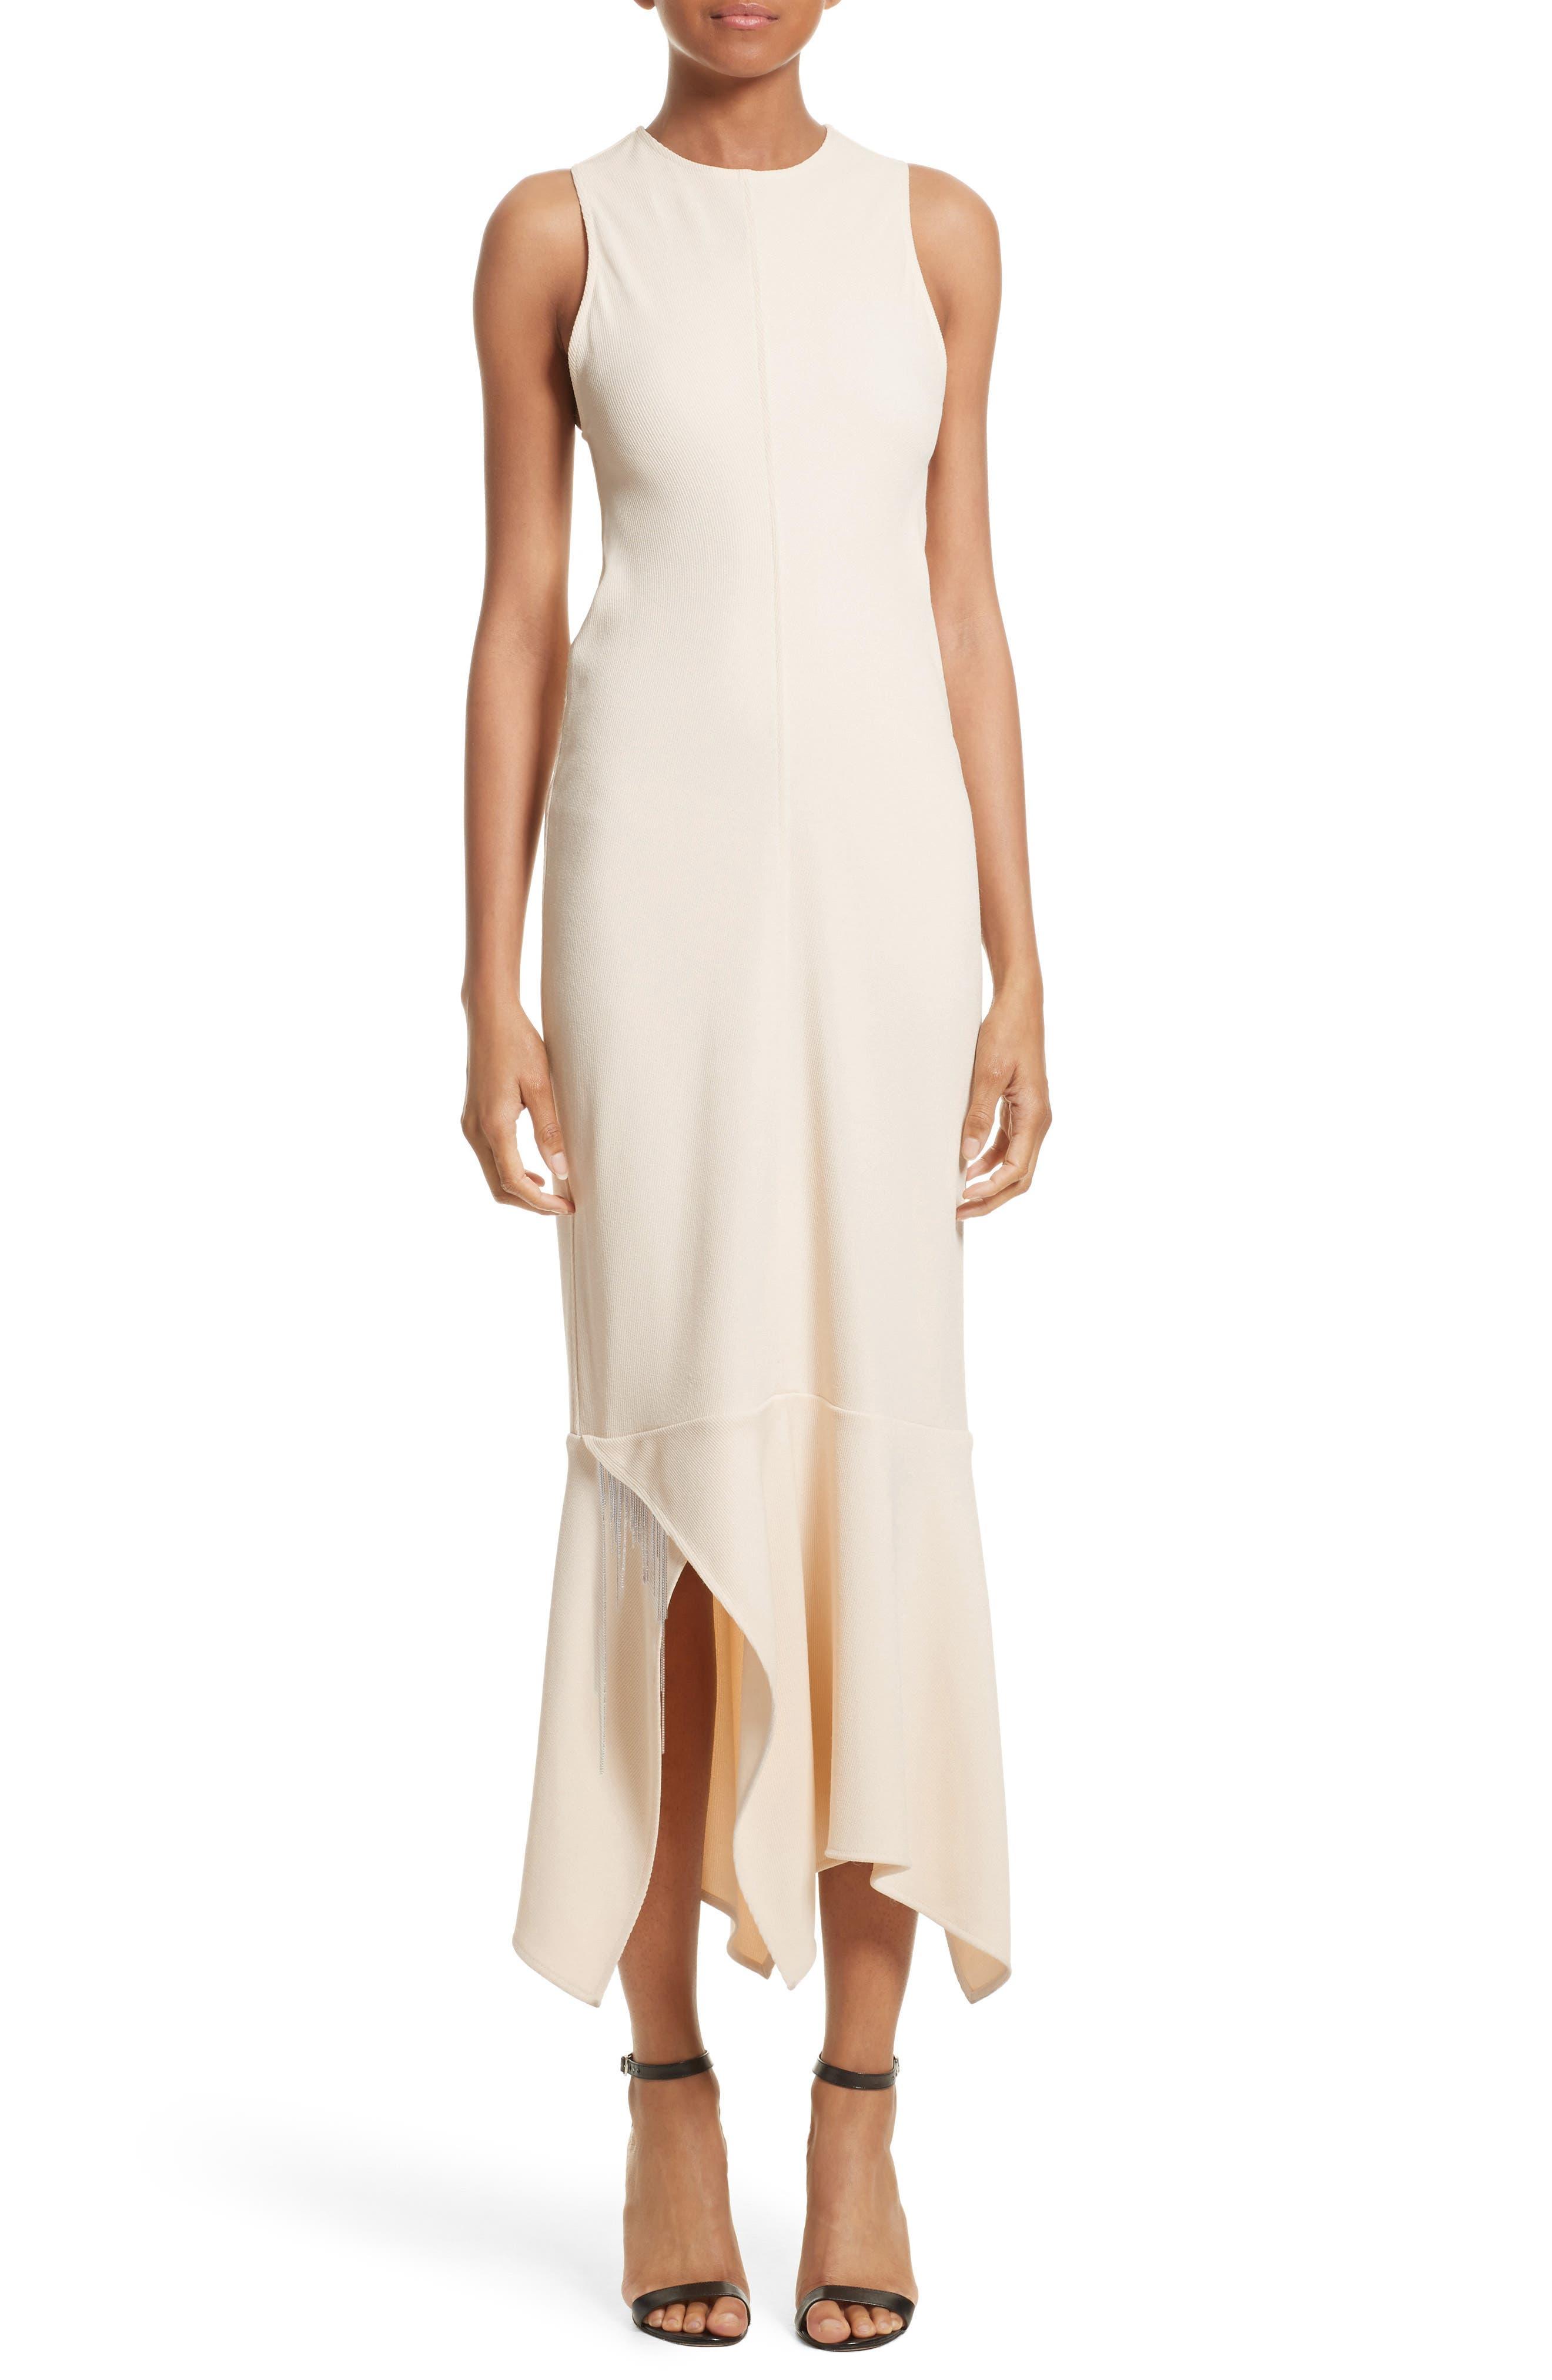 Alternate Image 1 Selected - Victoria Beckham Handkerchief Hem Racerback Dress